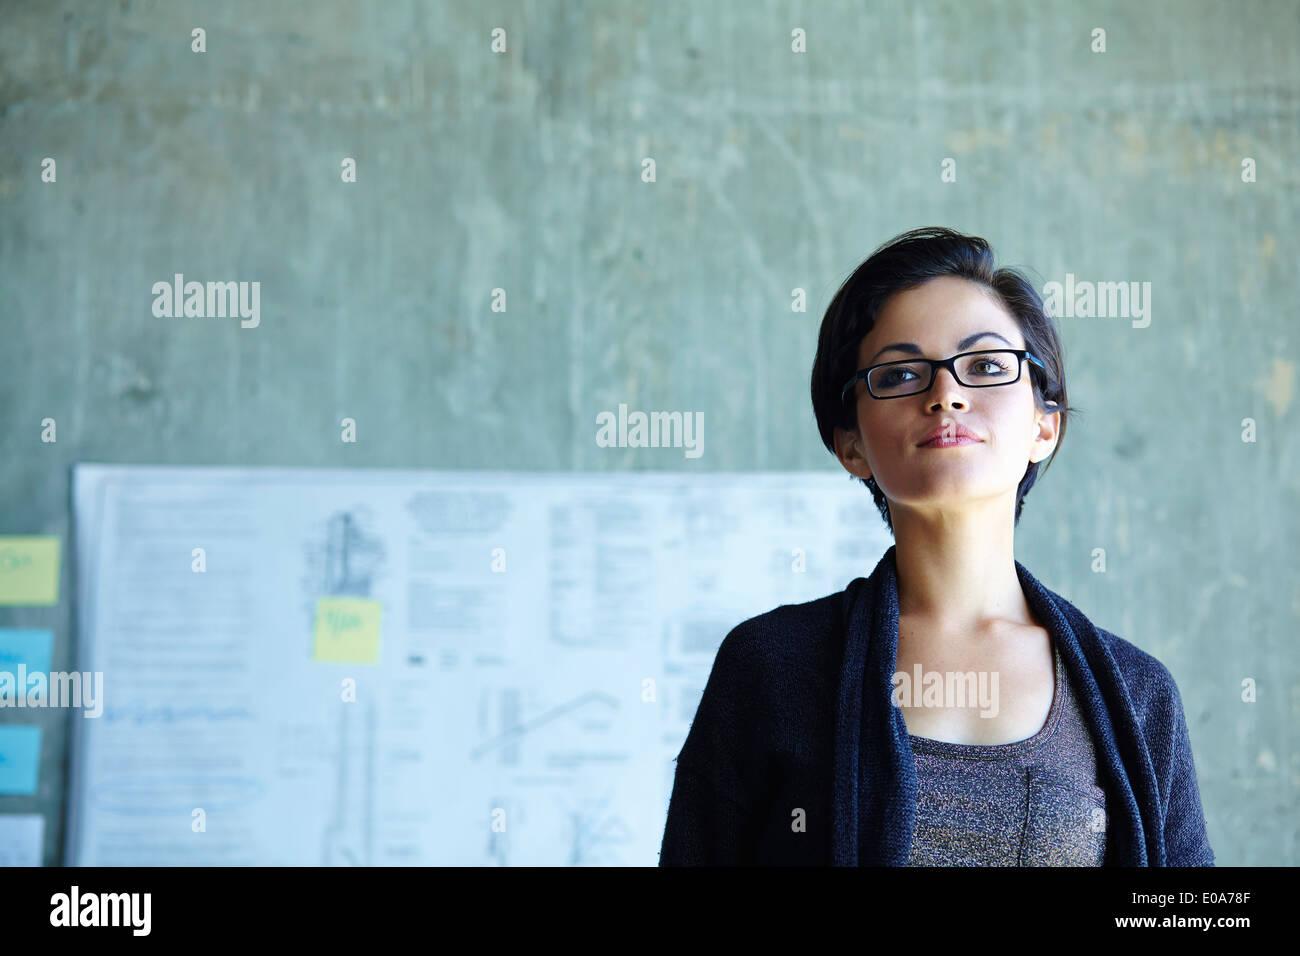 Retrato de grave joven empresaria en Office Imagen De Stock